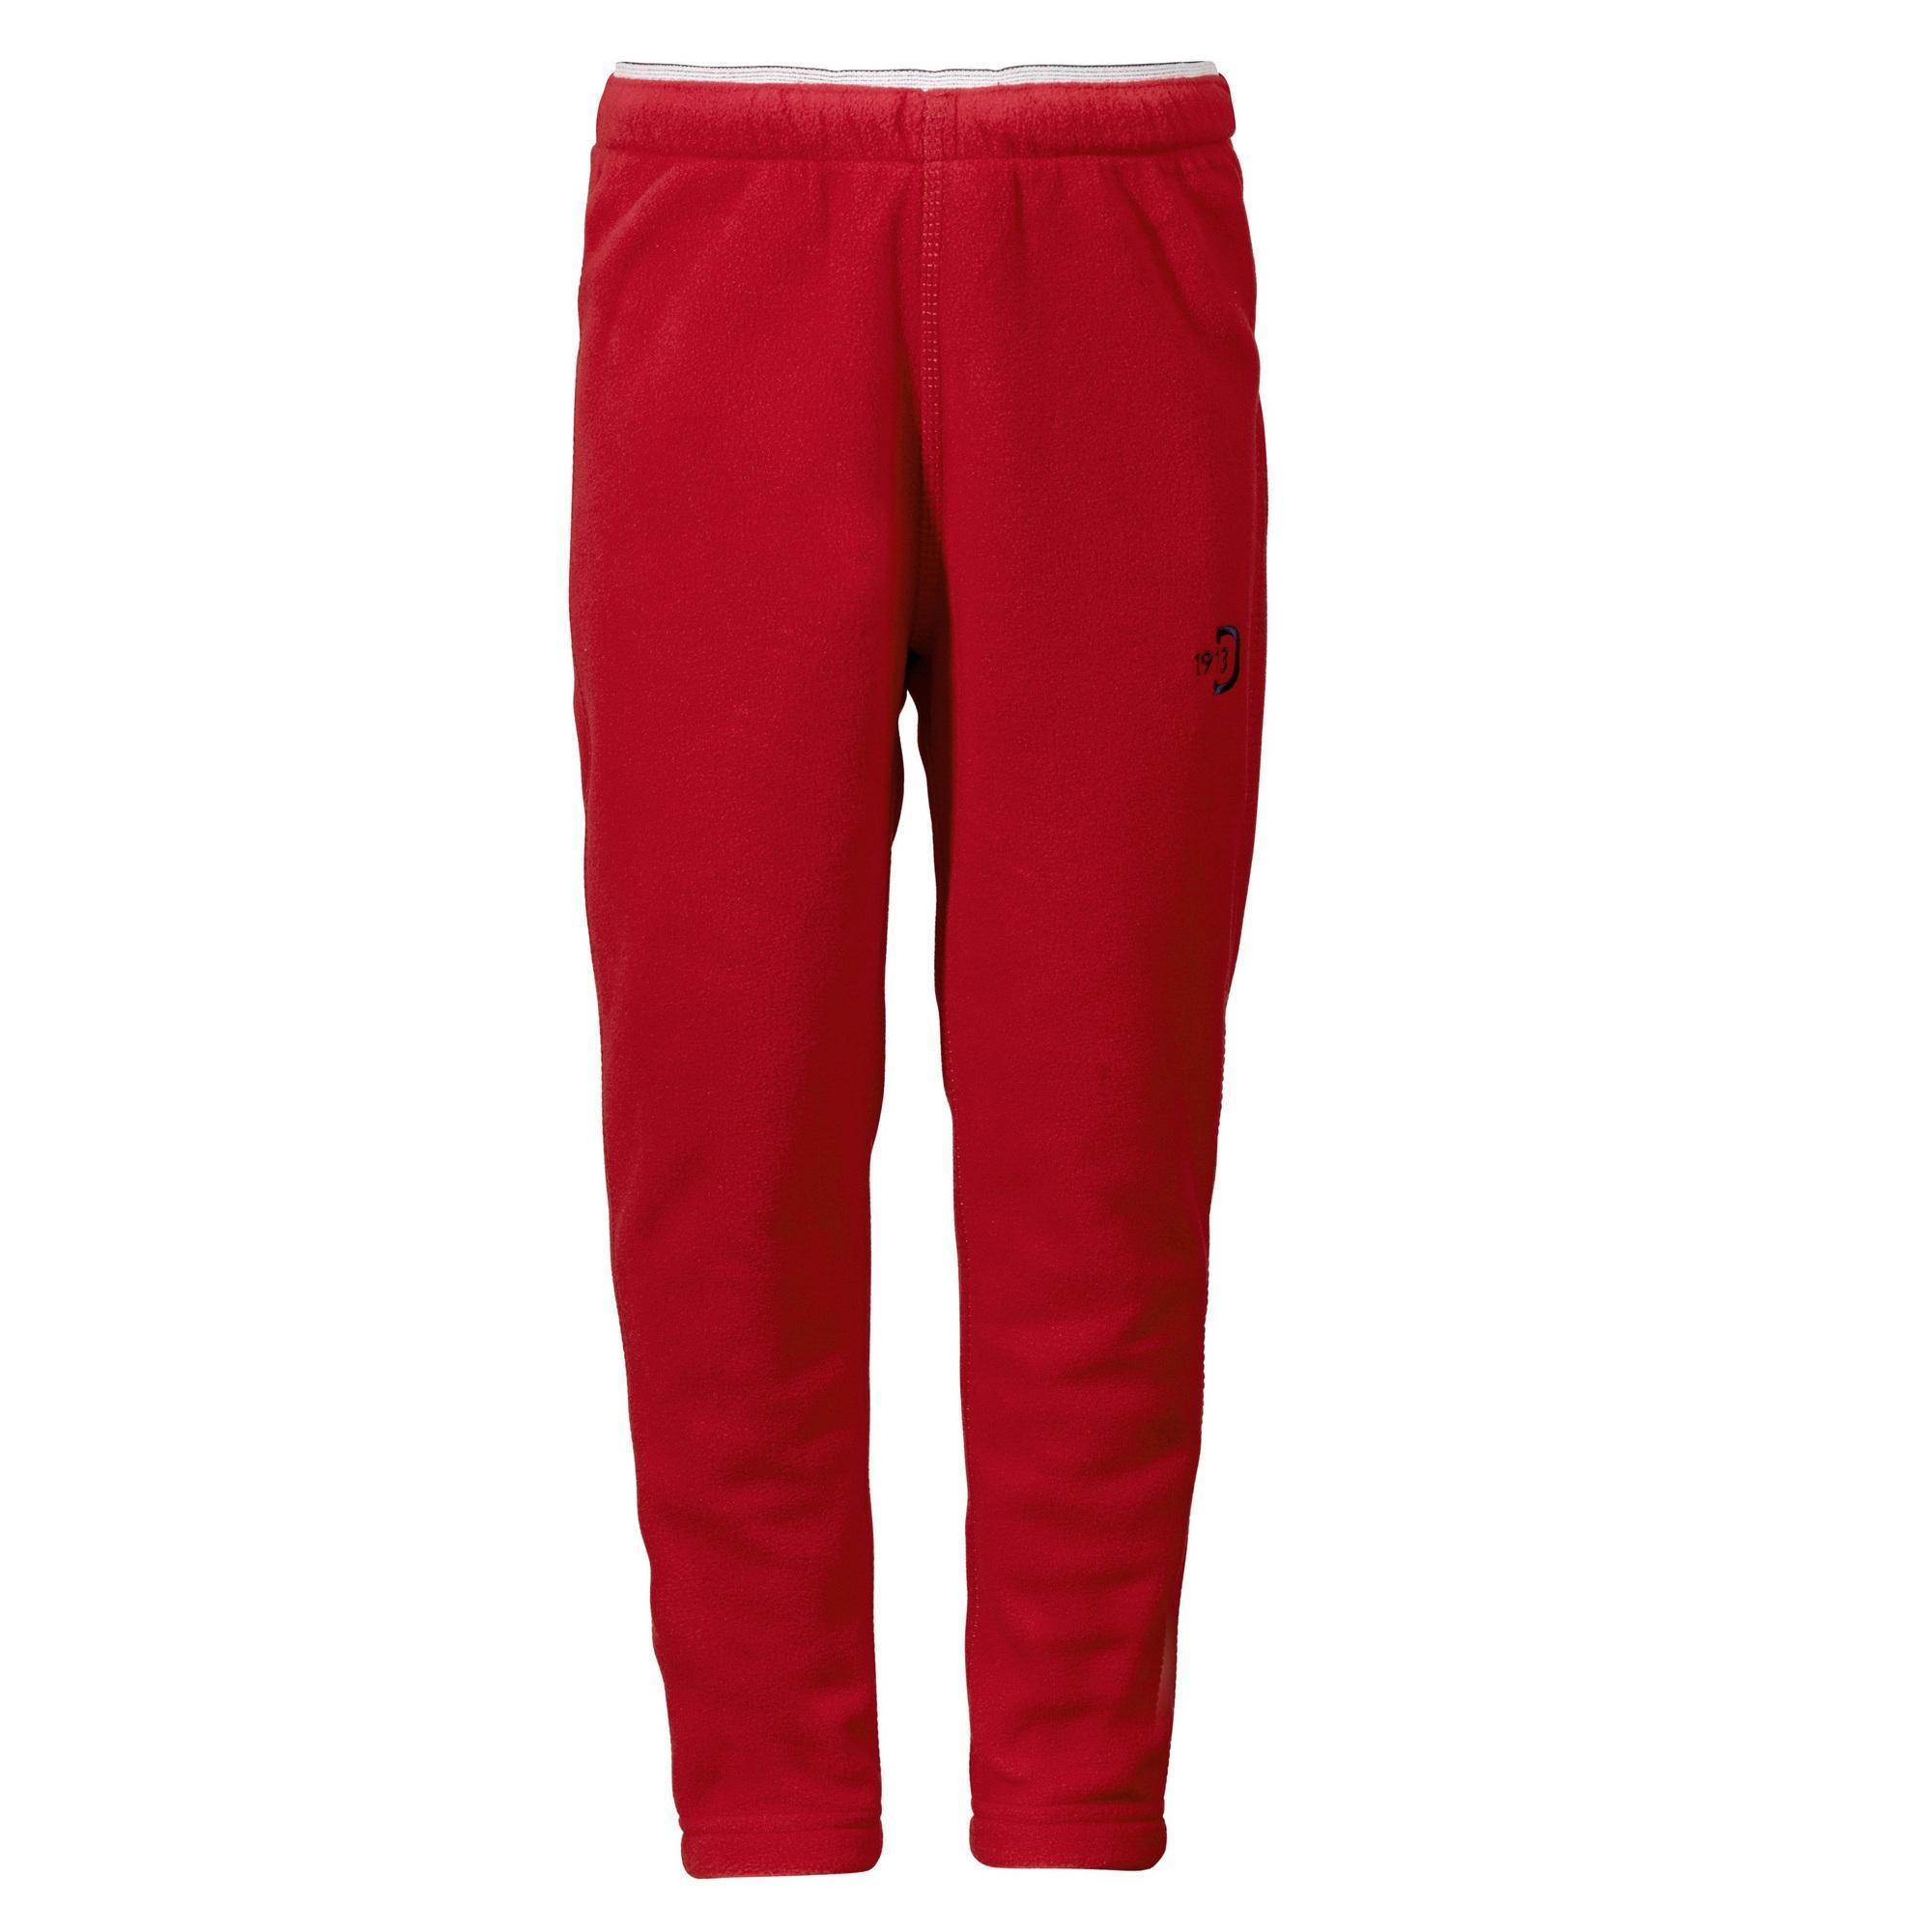 Брюки для детей Didriksons Monte kids - Red (красный)